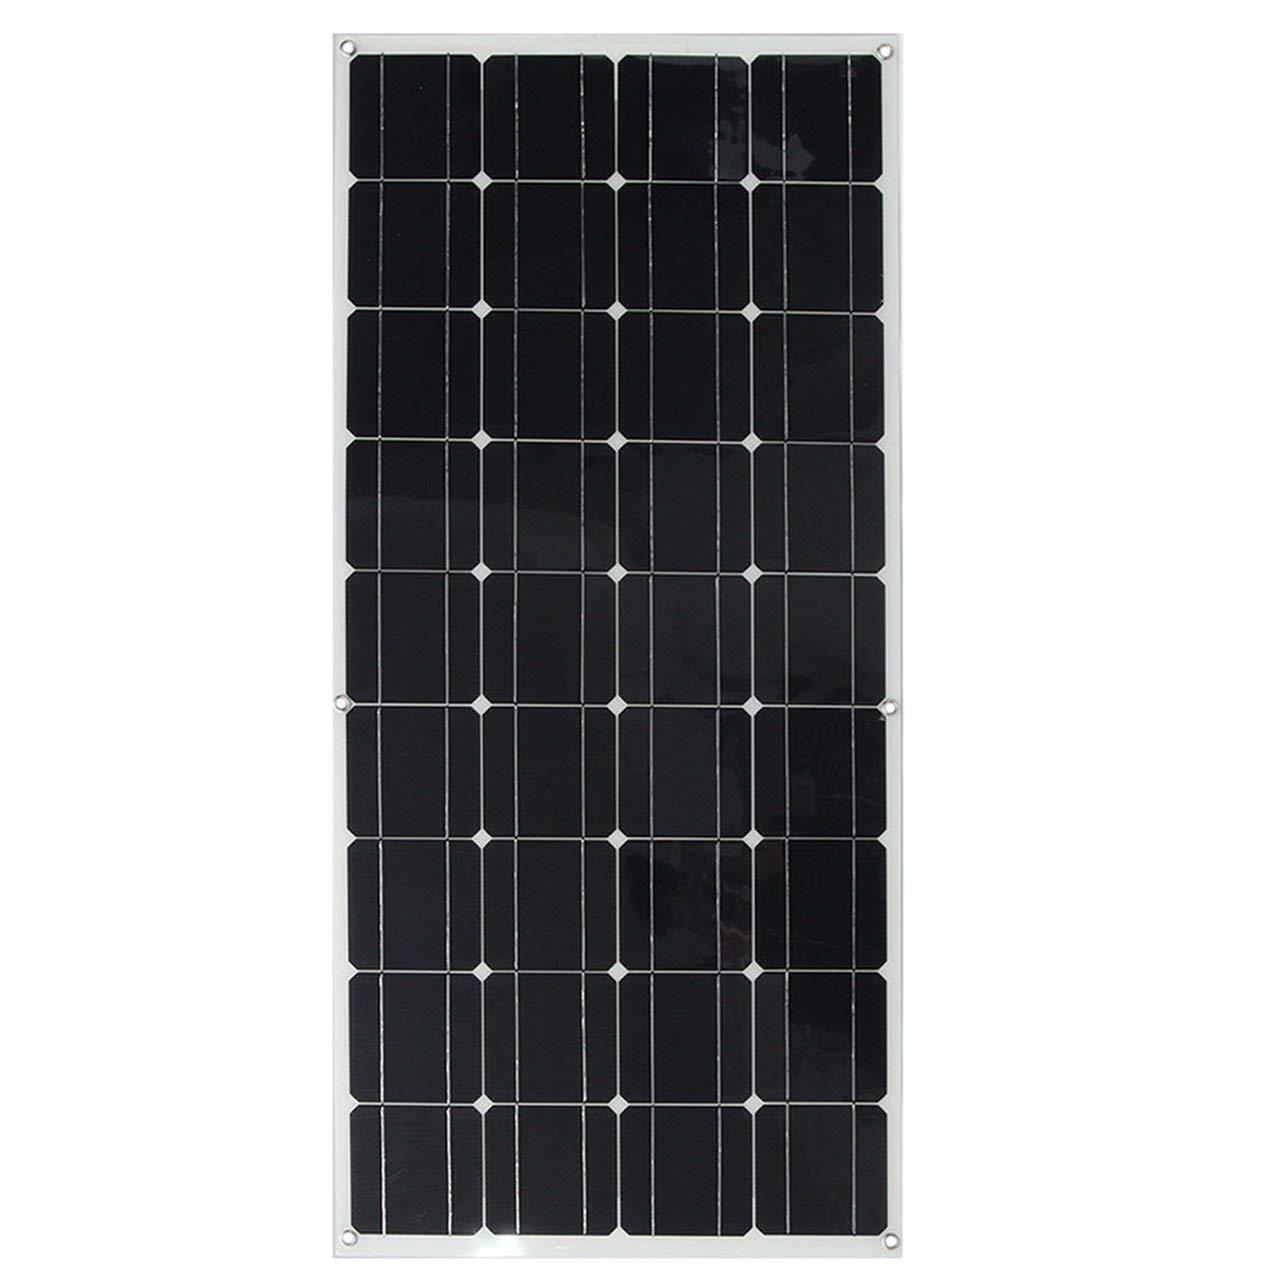 DeeploveUU RVのボートのためのElfeland 120W 12V Aクラスの半適用範囲が広い太陽電池パネルの充電器に合いなさい B07QKZCLM2